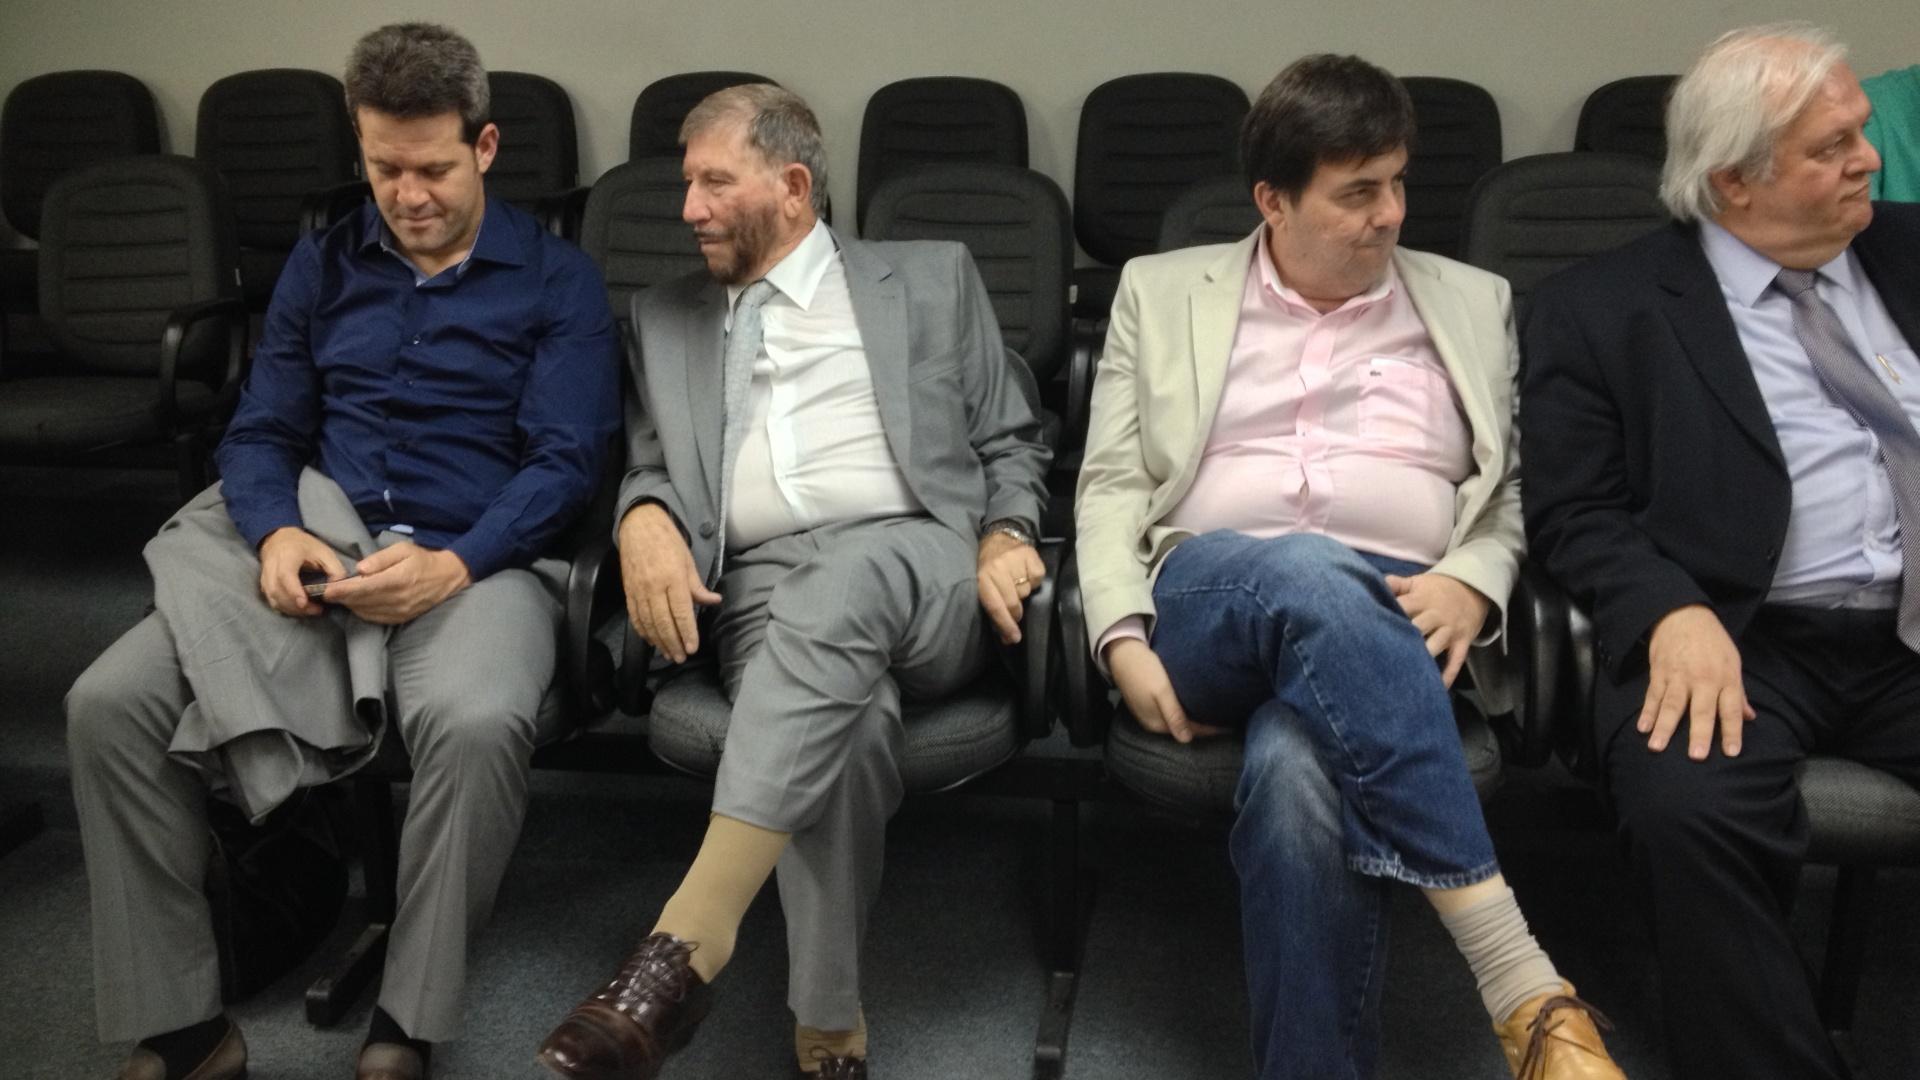 Cúpula da Lusa no STJD: Argel, José Ilídio Lico, Marcos Rogério Lico e o advogado José Luiz Ferreira de Almeida